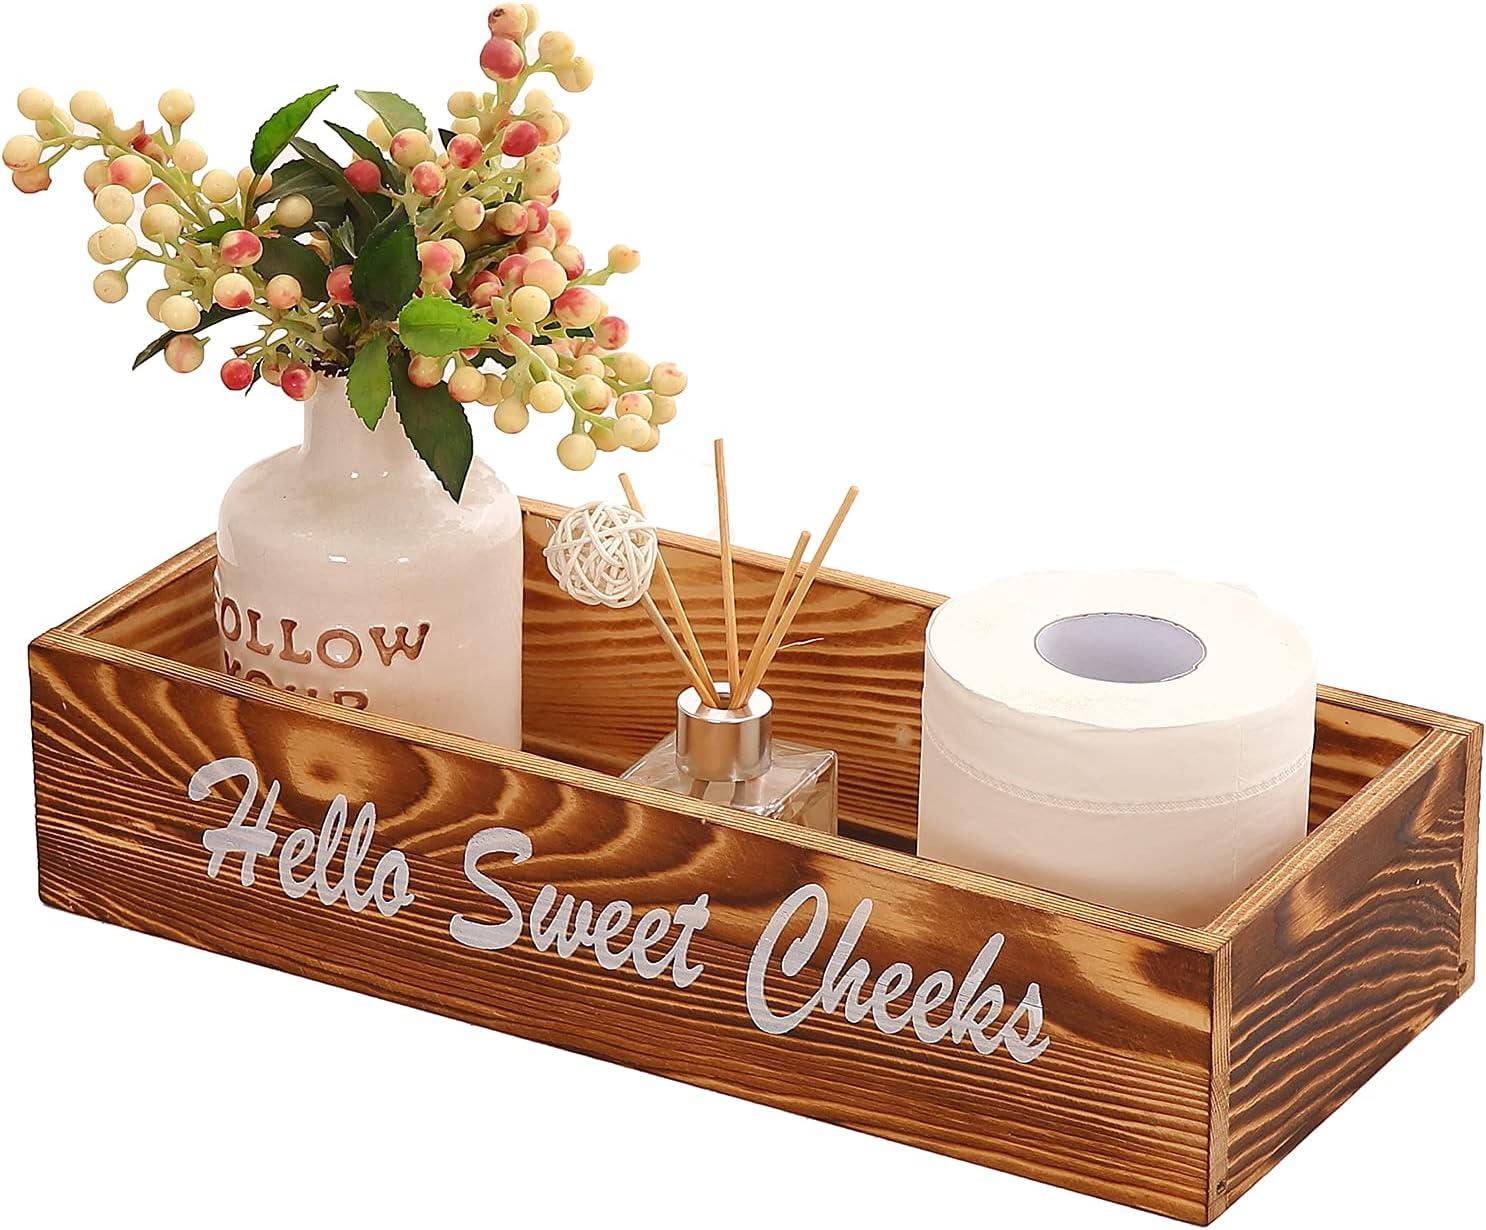 Bathroom Box Decor Rustic Max 90% OFF Orga Ranking TOP3 Trays Holders